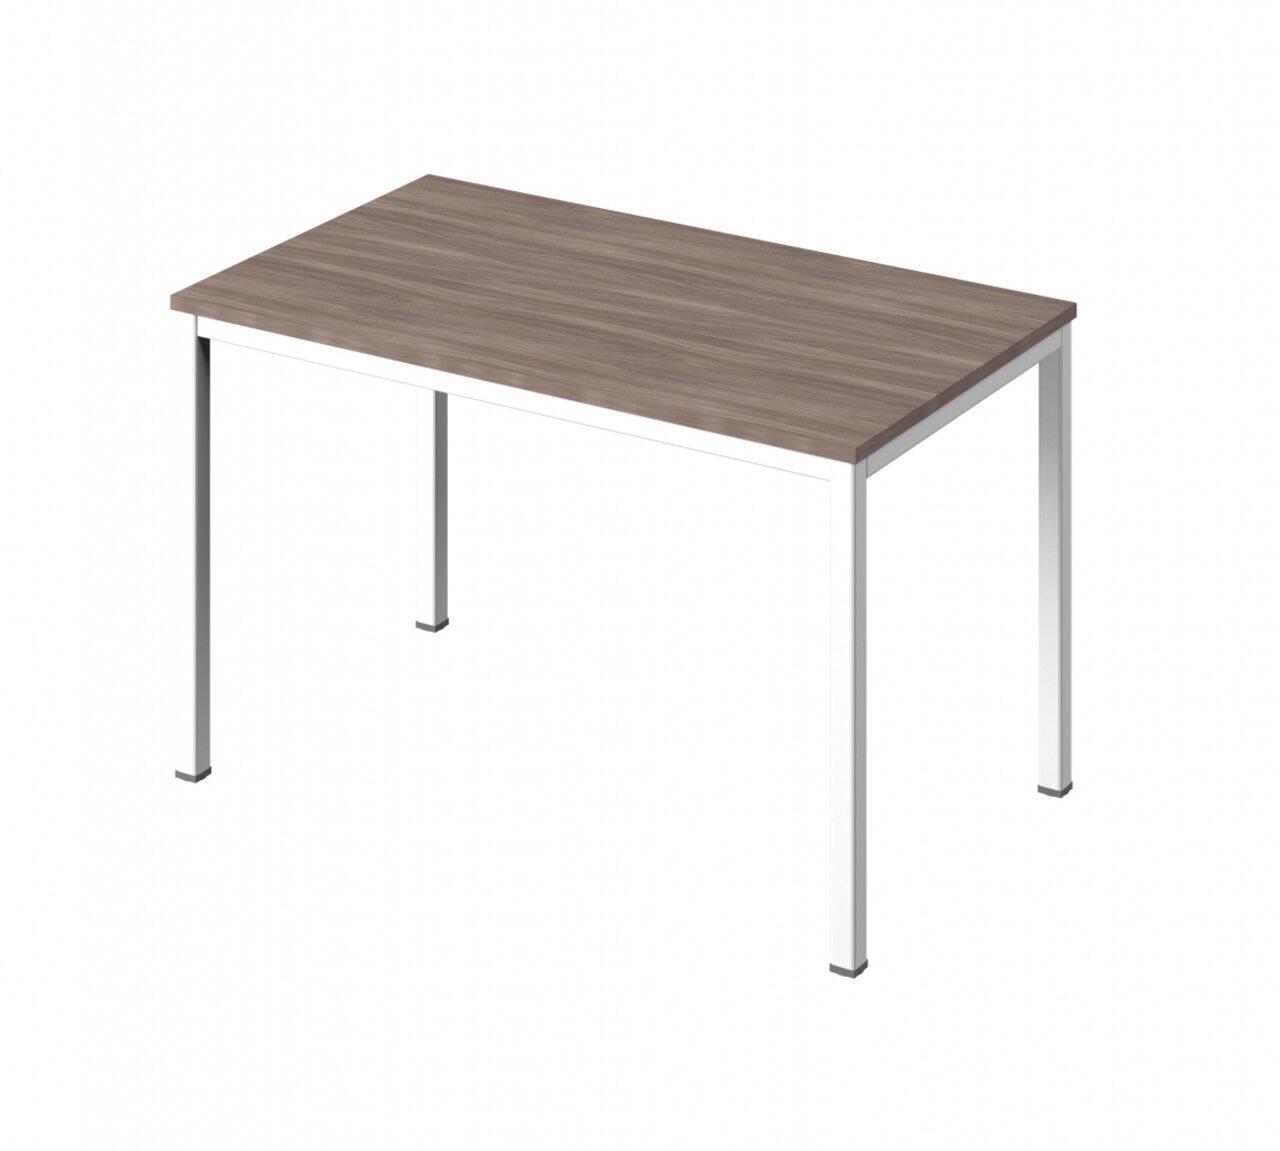 Стол на металлокаркасе без заглушек кабель-канала - фото 3